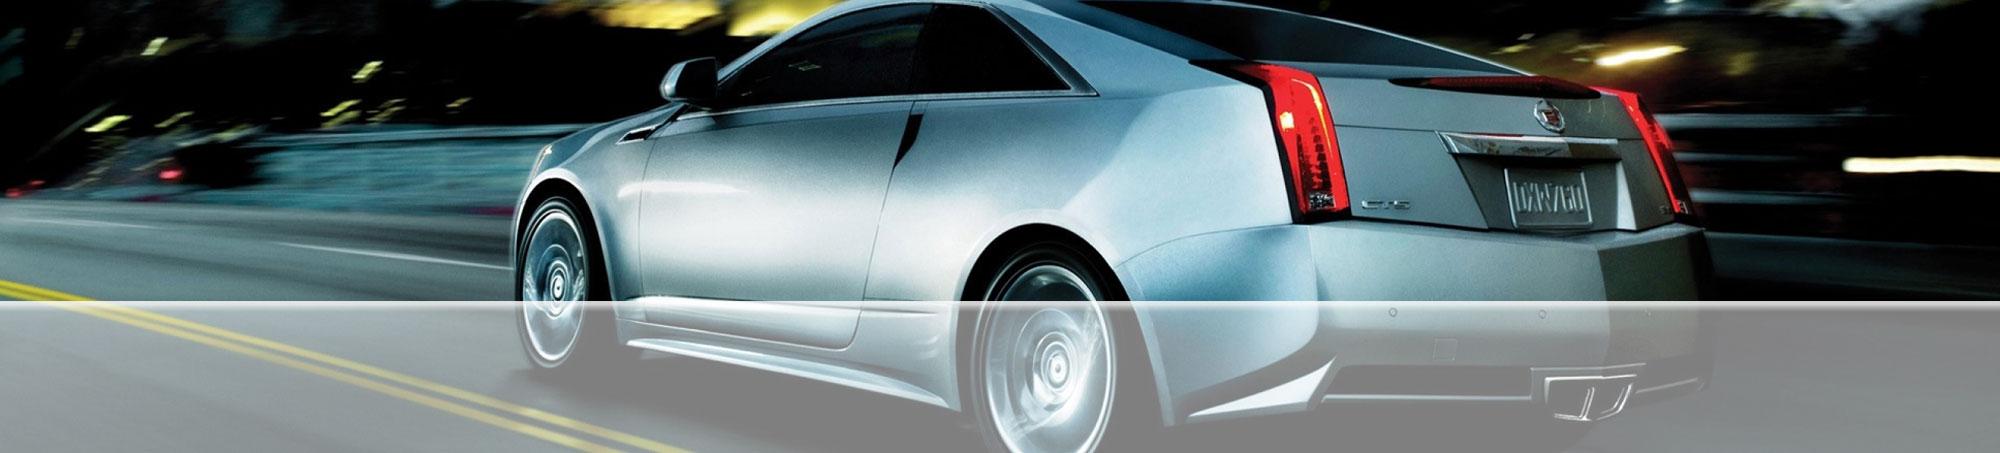 H R Auto Motors Used Cars San Antonio Tx Dealer